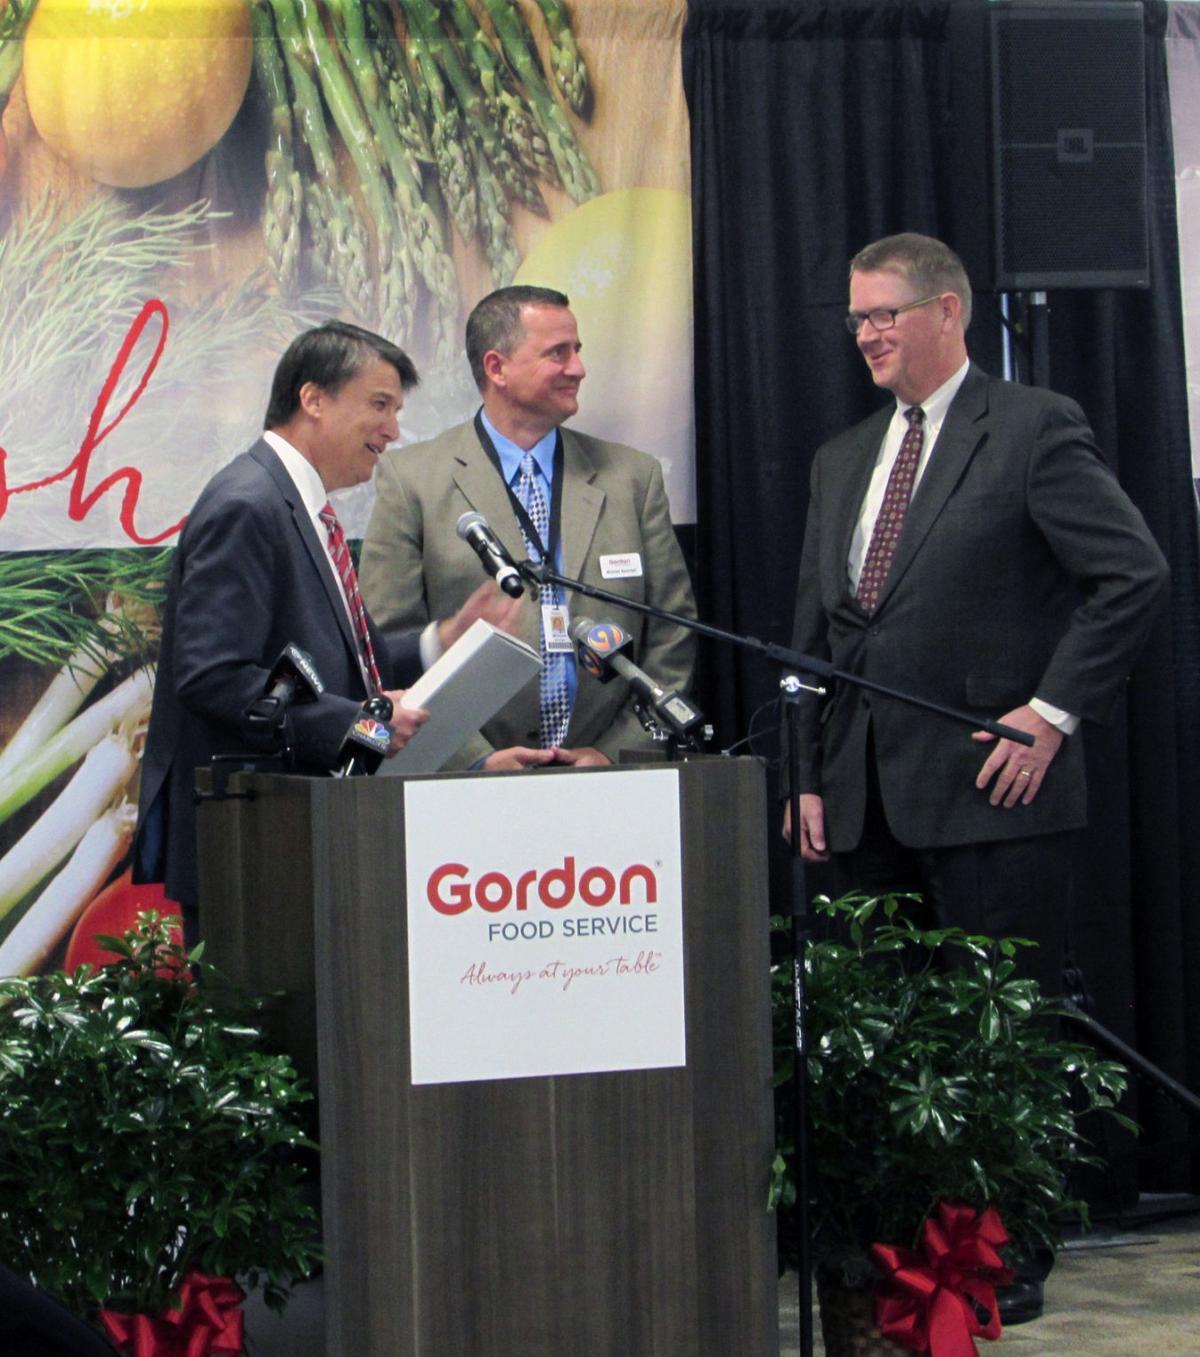 Gordon Food Service Jim Gordon